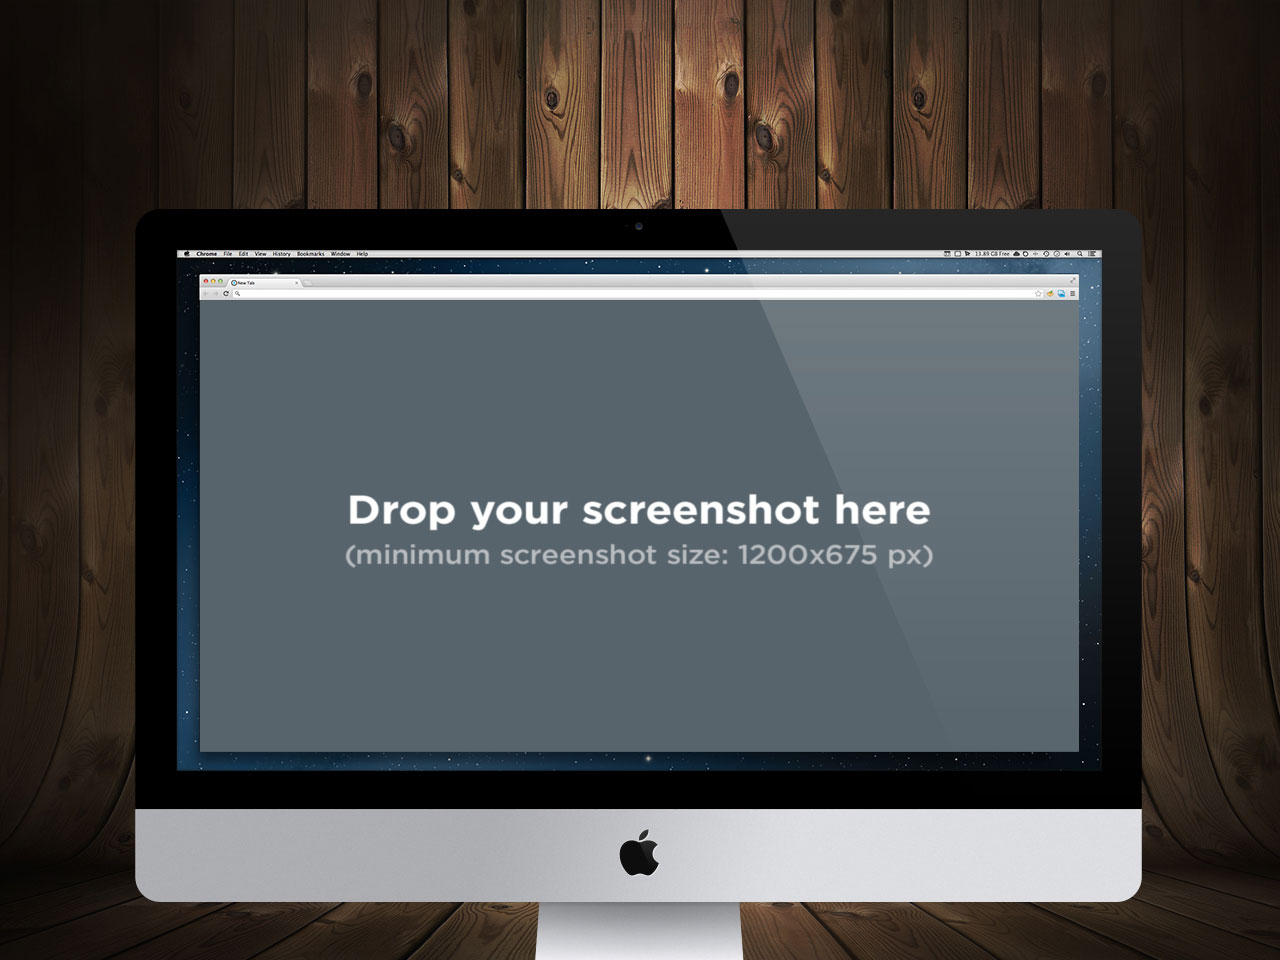 iMac 27in OSX Product Shot Screenshot Mockup